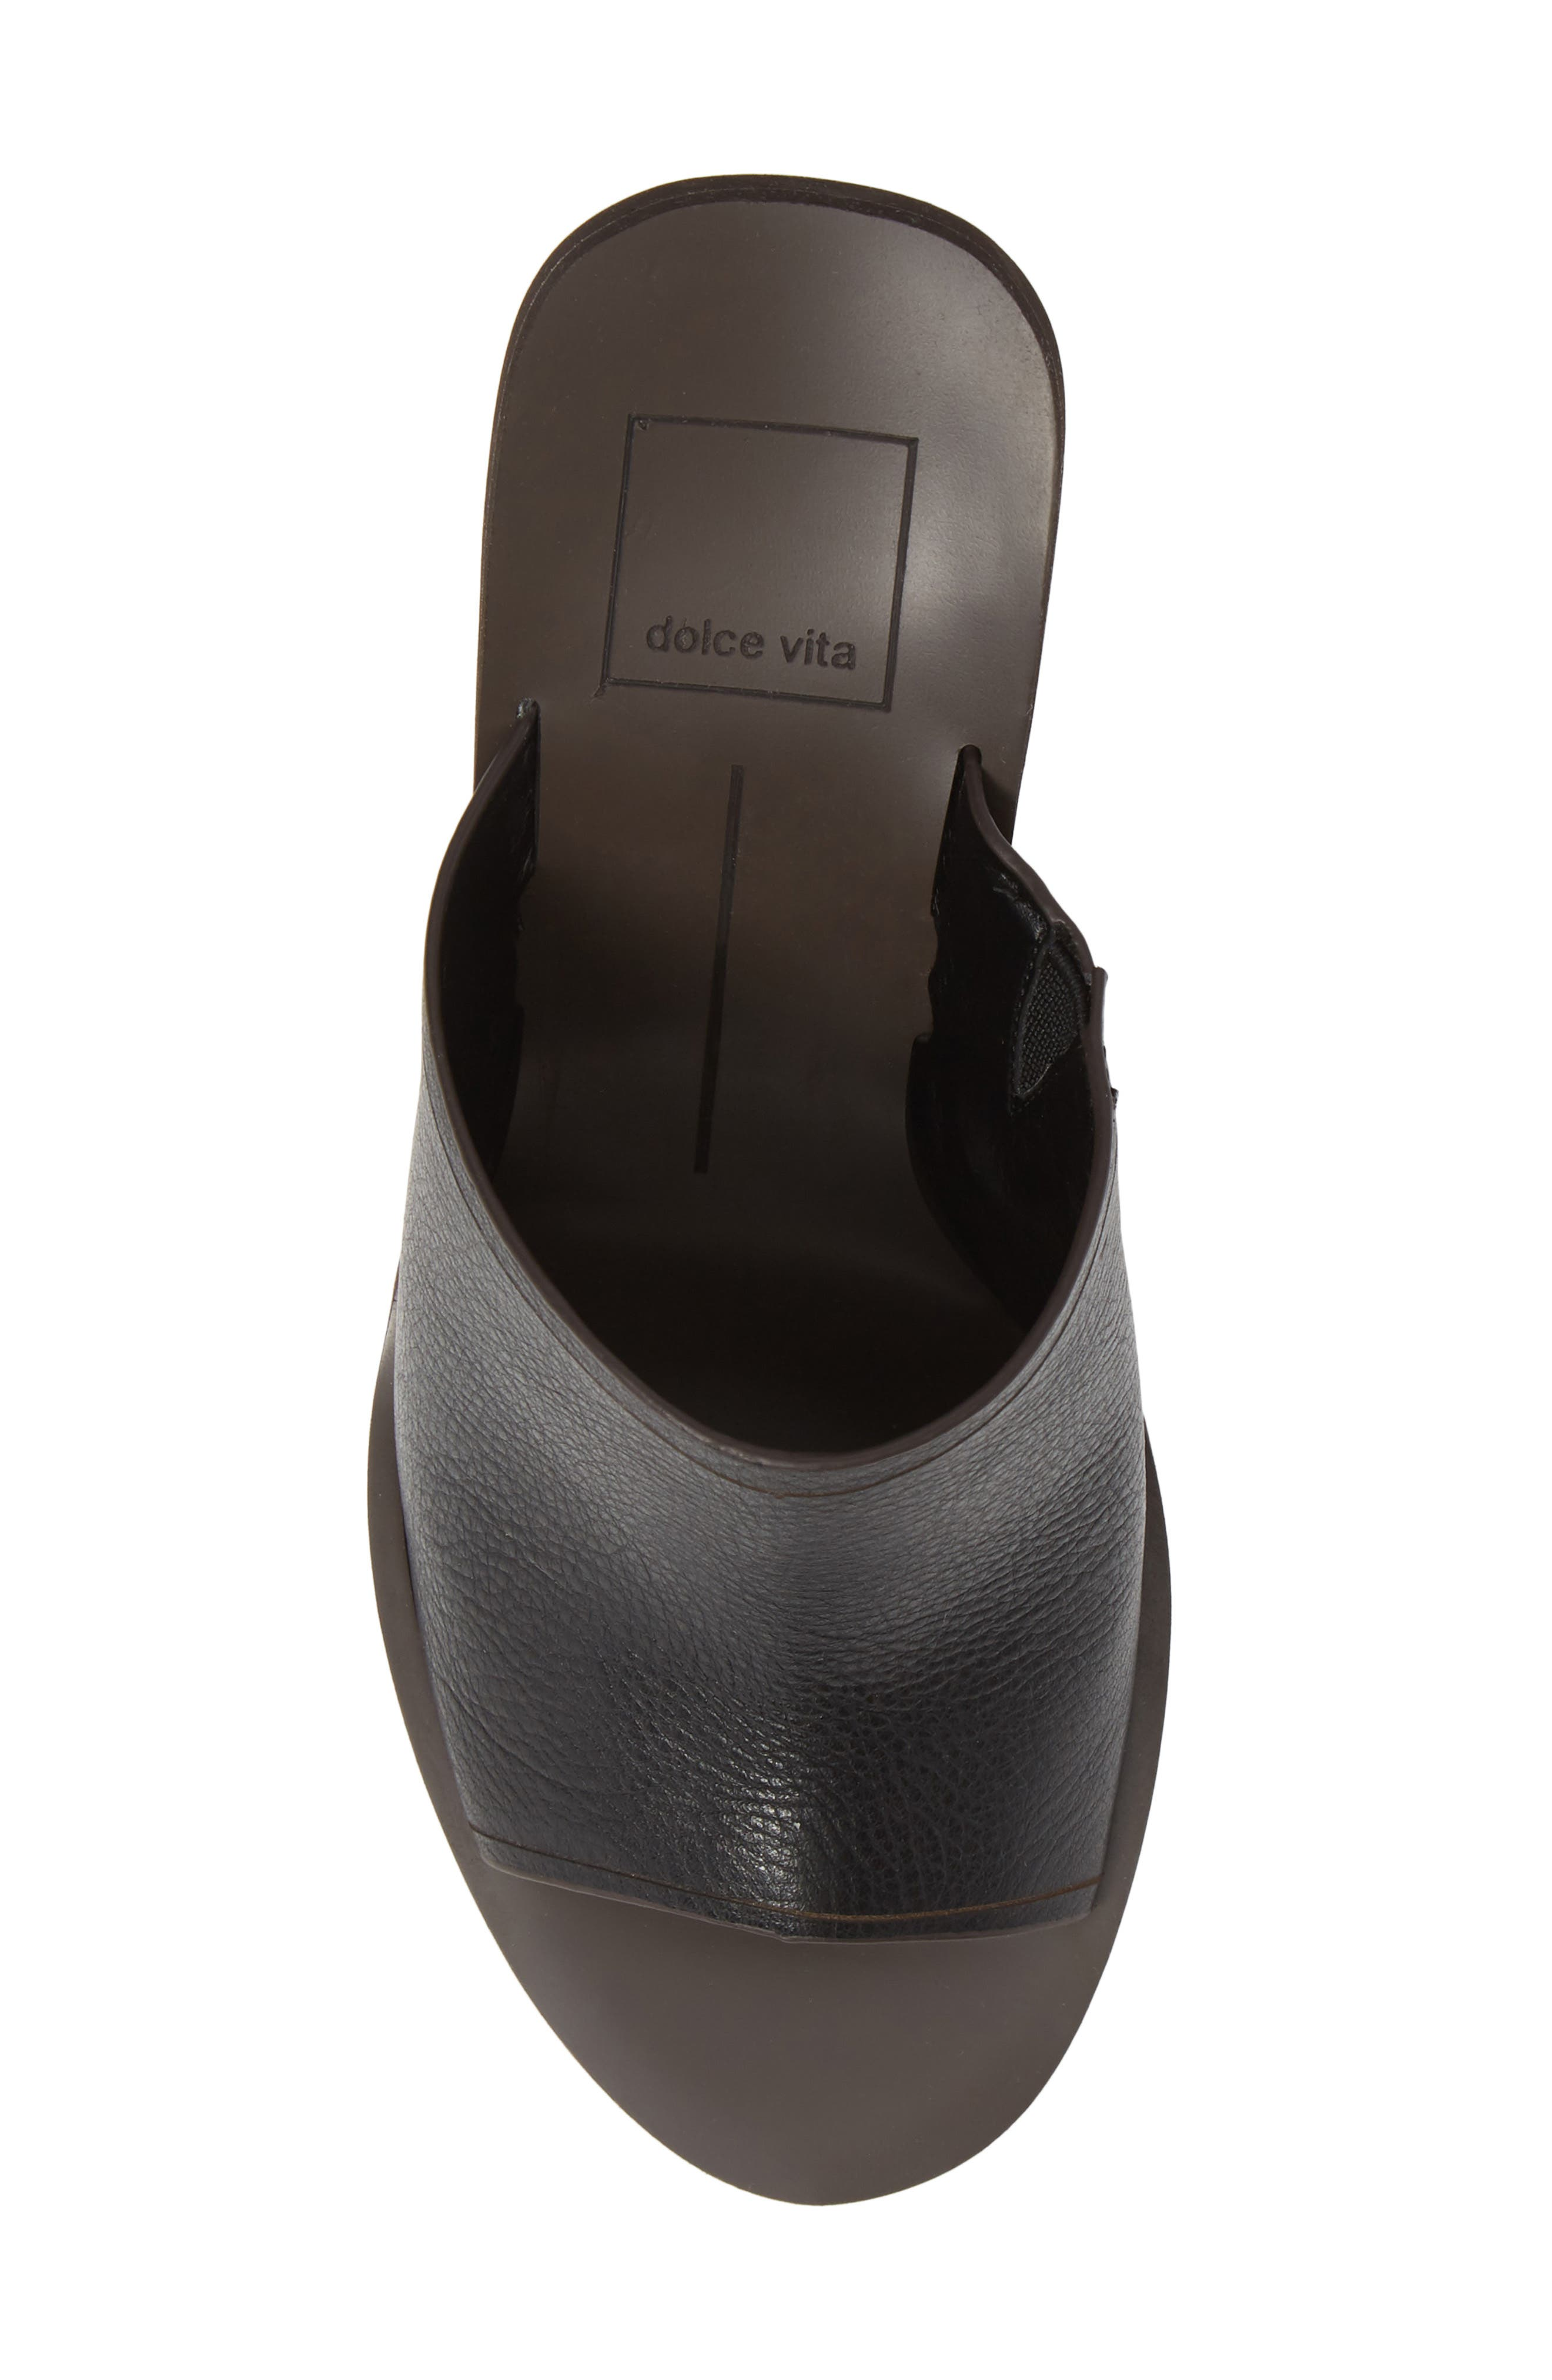 DOLCE VITA, Alba Braided Heel Mule Sandal, Alternate thumbnail 5, color, BLACK LEATHER